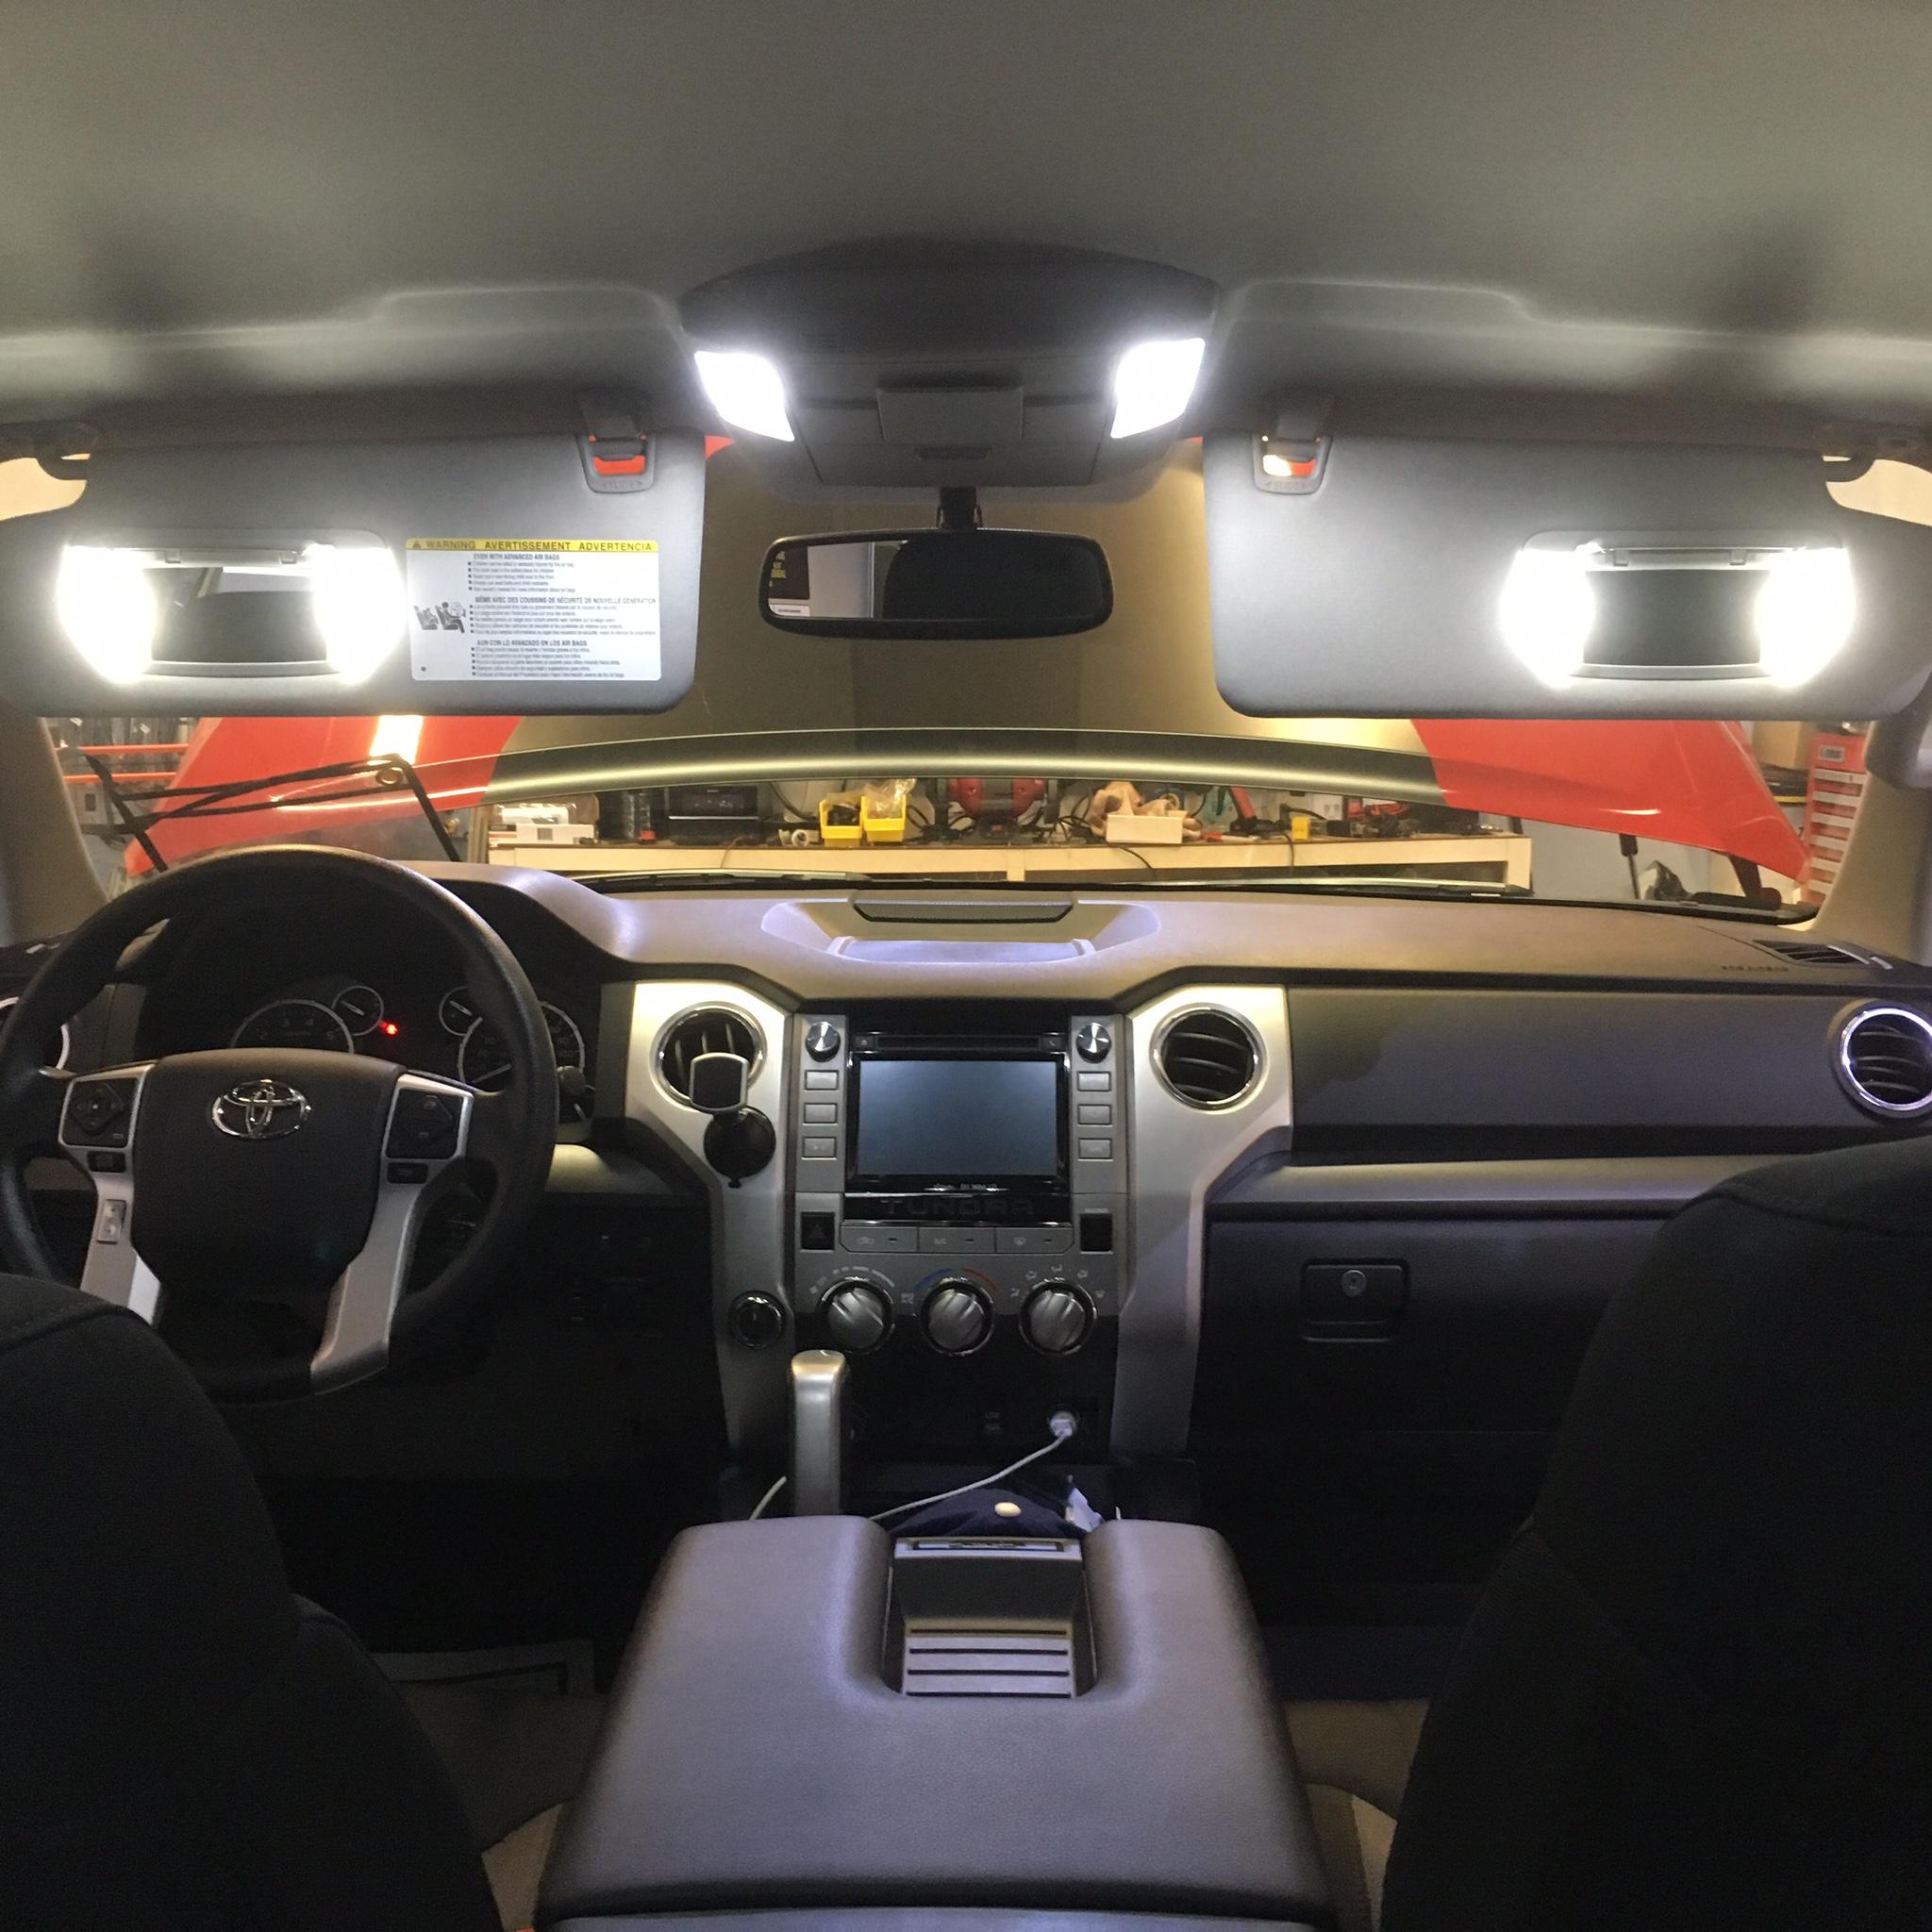 LED Interior Lighting Set blue red white pink green Lights All Audi SMD